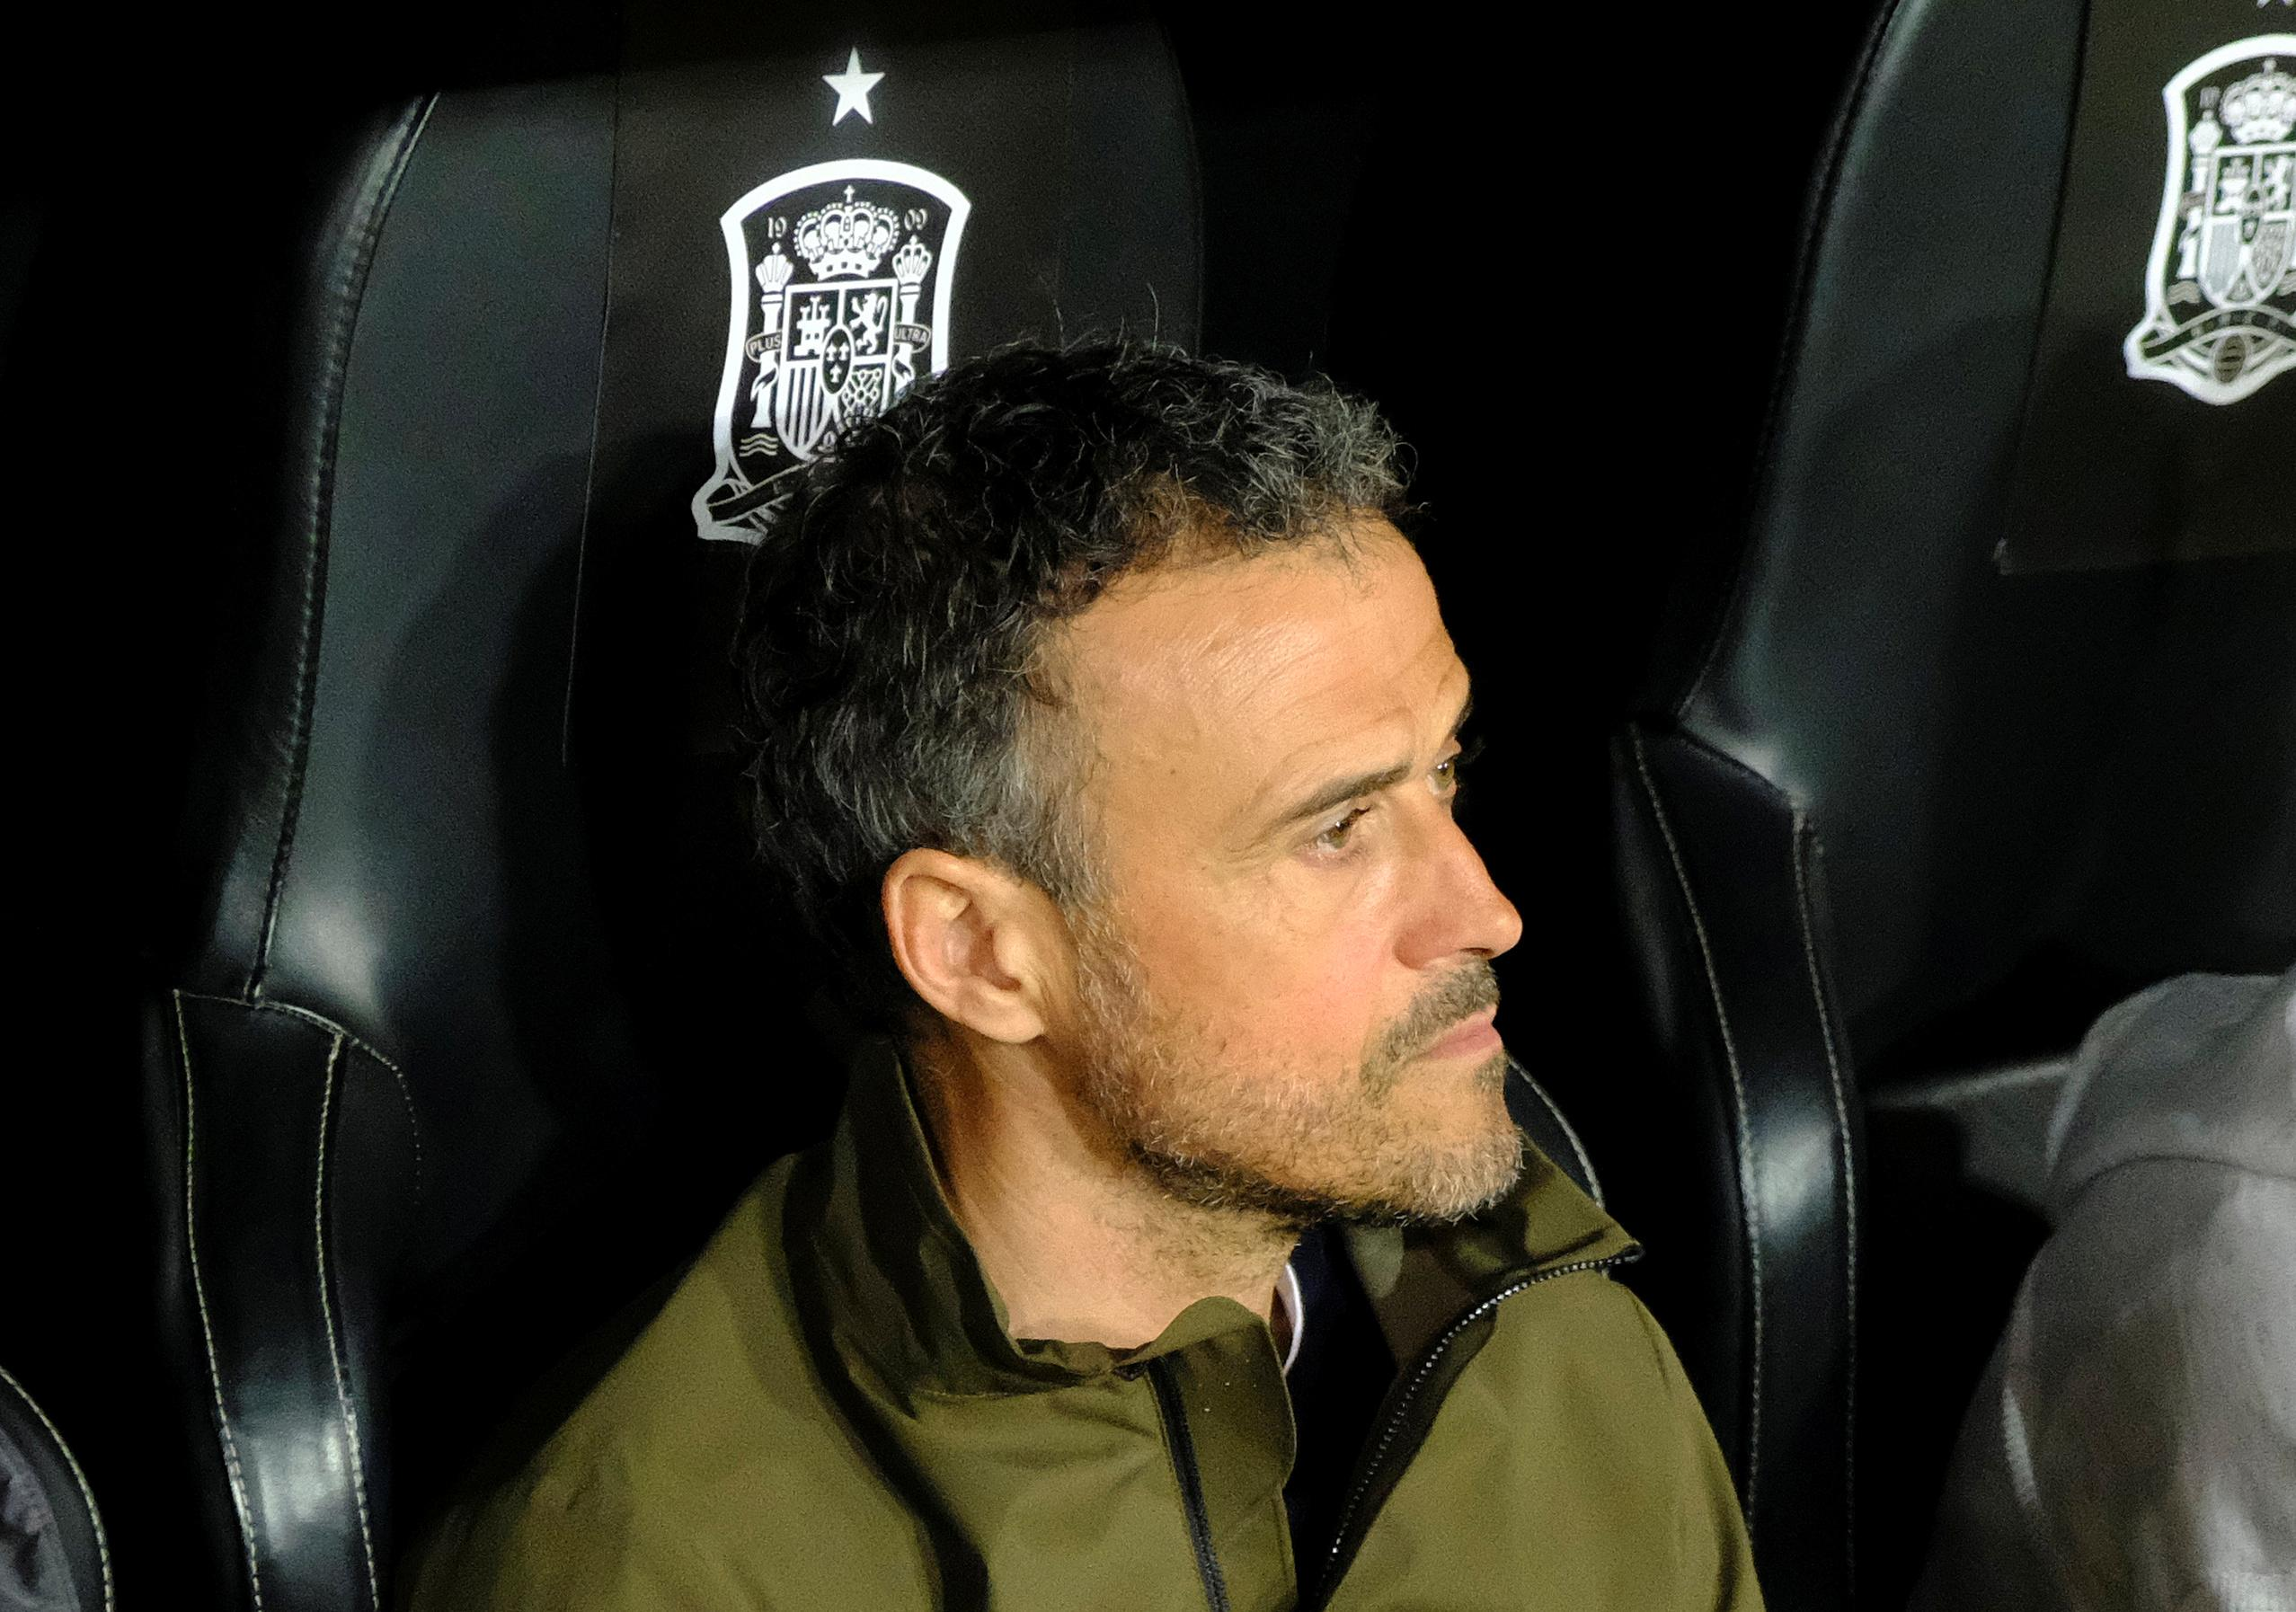 Soccer: Spain keep faith with coach Enrique despite continued absence